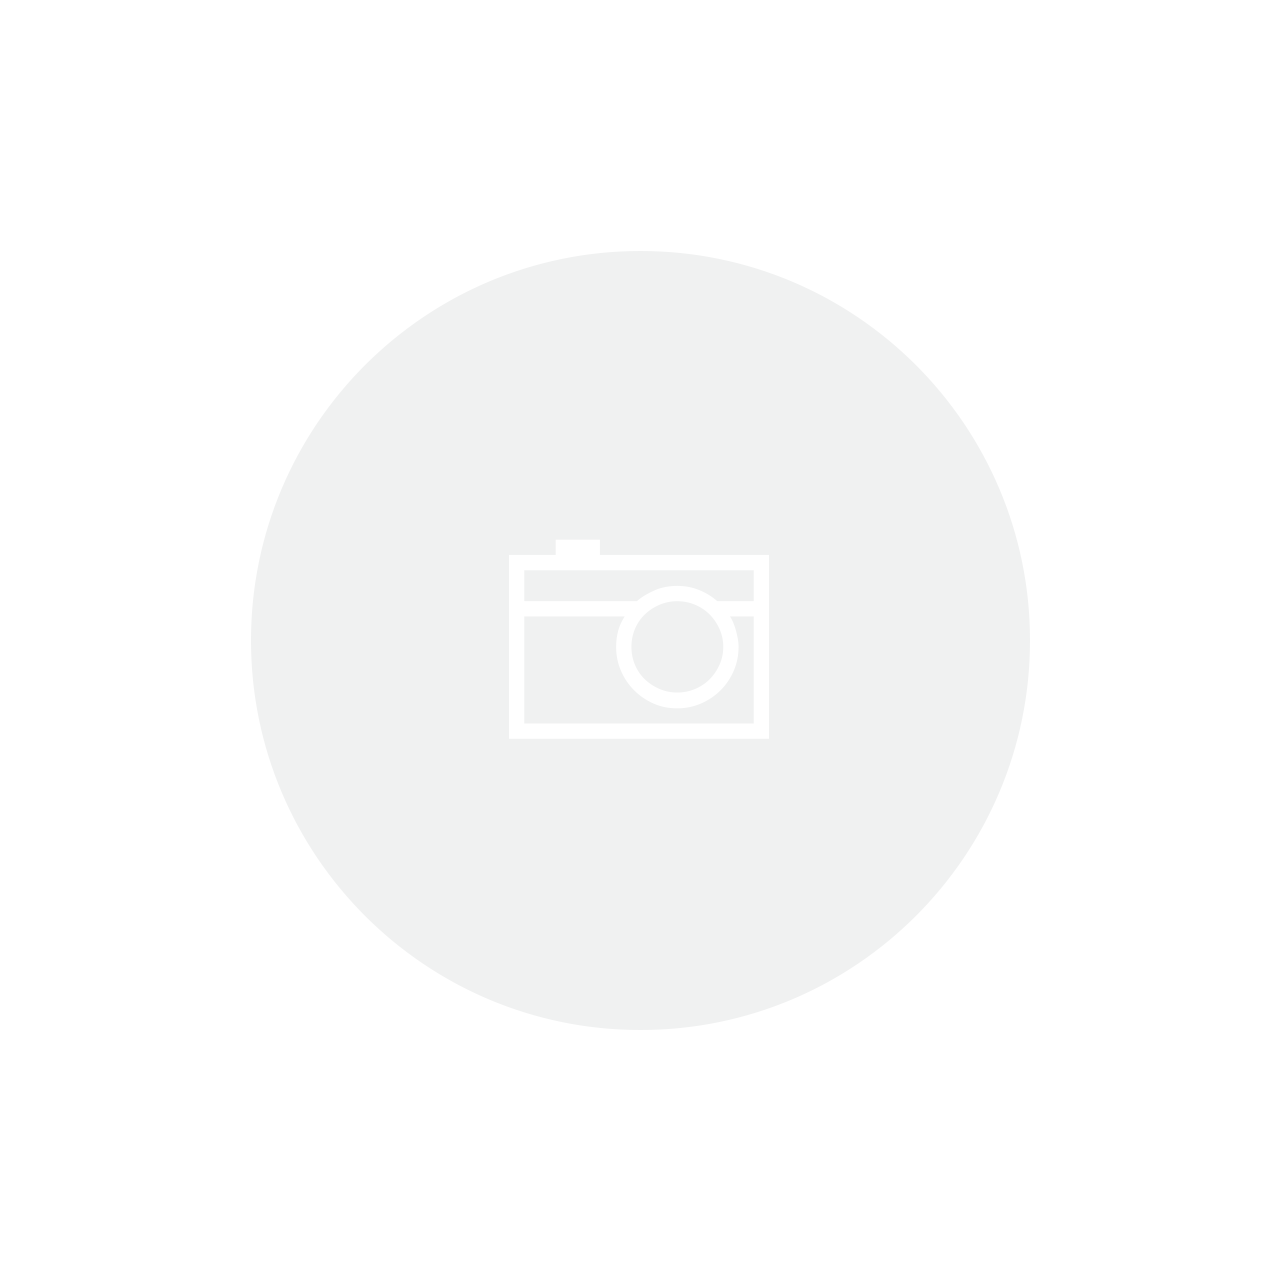 Cozi-Vapore Inox 16Cm 1,60 Litros Duo Silicone Tramontina